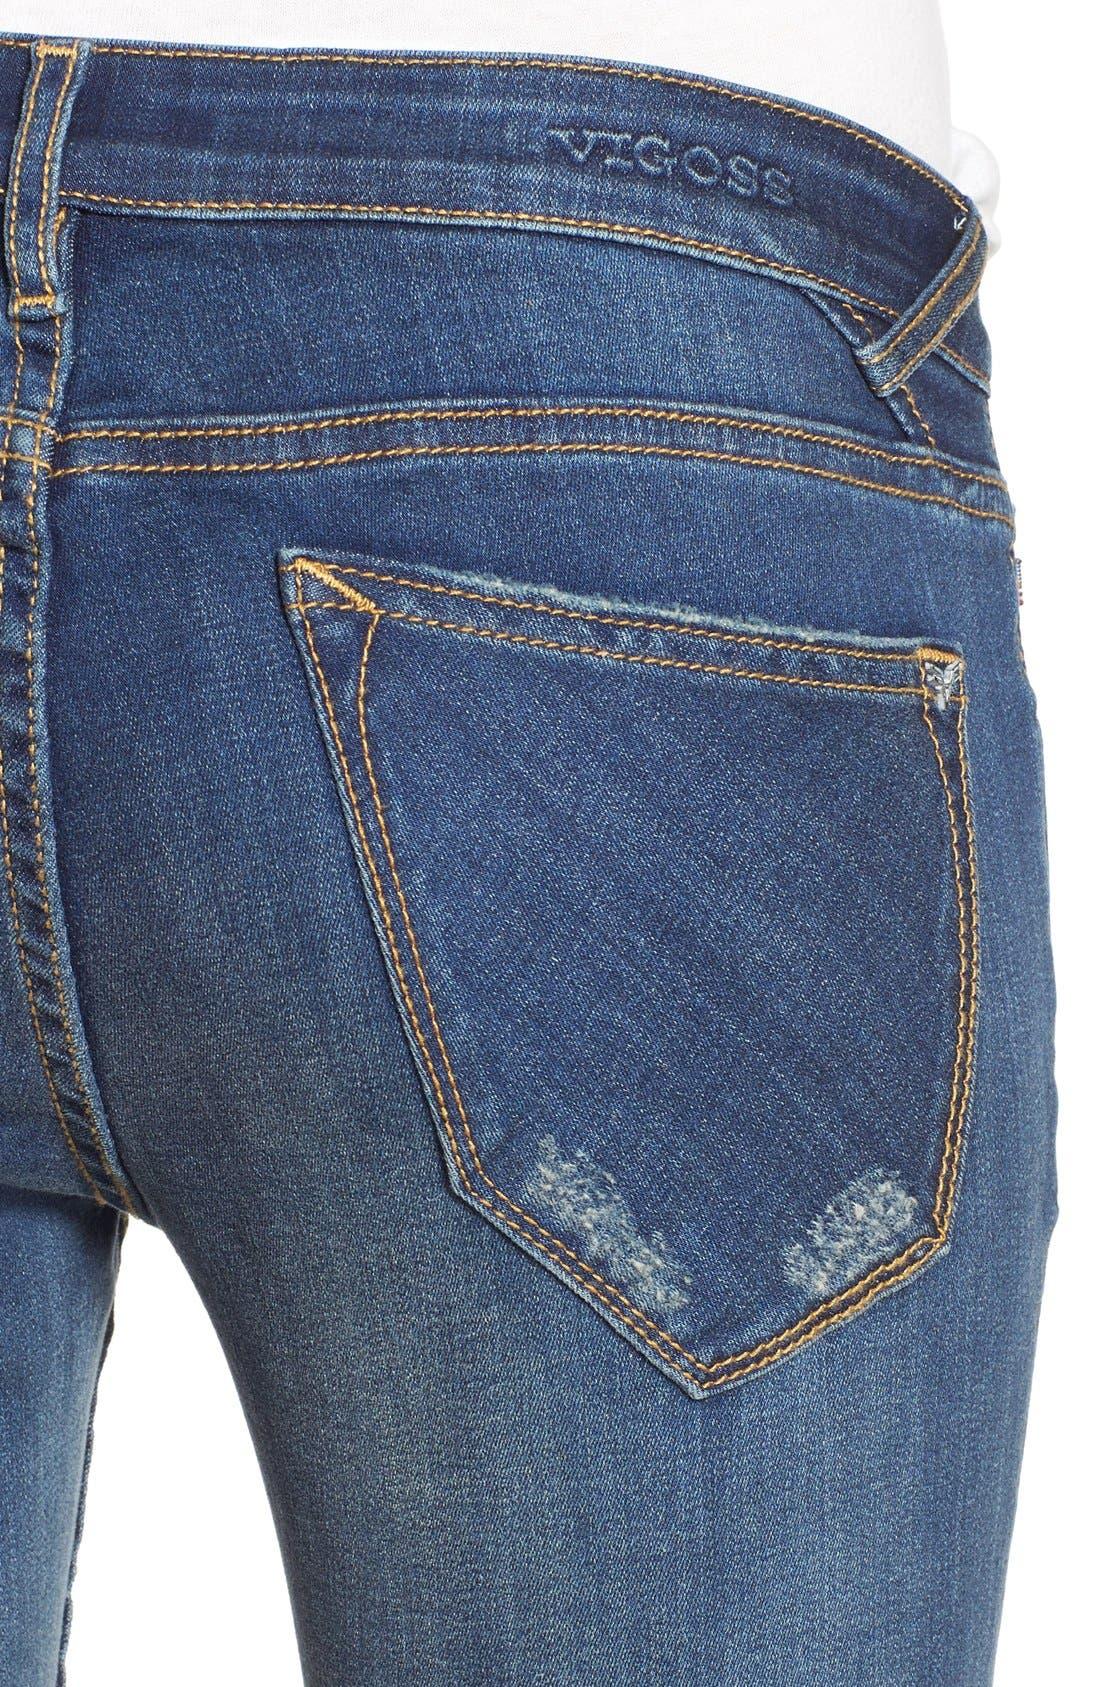 VIGOSS, 'Thompson' Distressed Skinny Jeans, Alternate thumbnail 2, color, 400